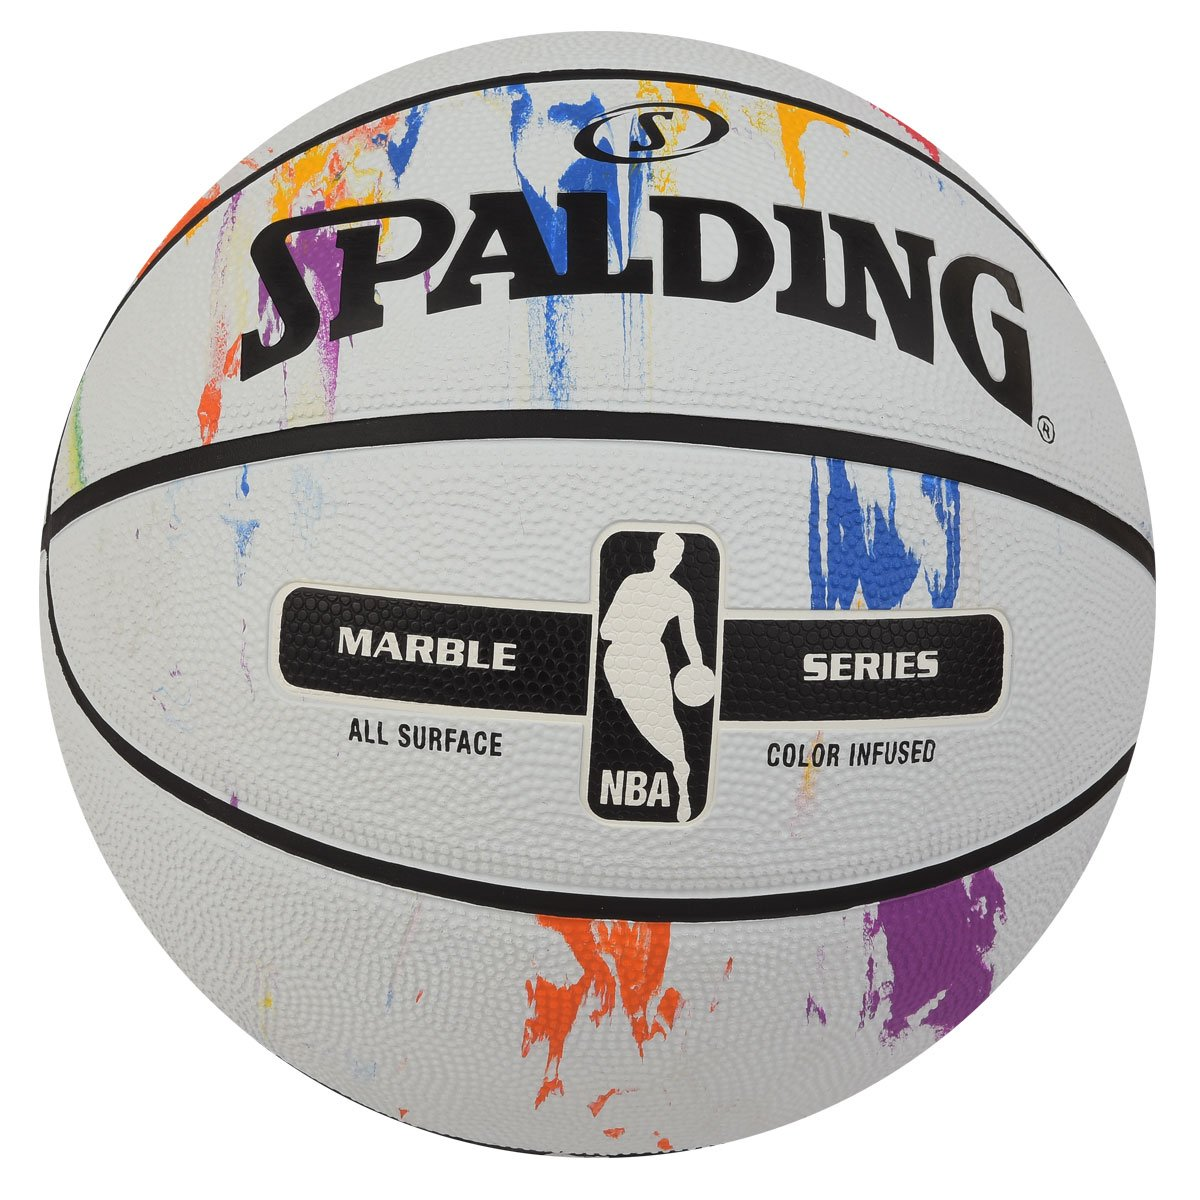 Spalding大理石製バスケットボール – 公式サイズと重量NBA。 B07B1FBRYK